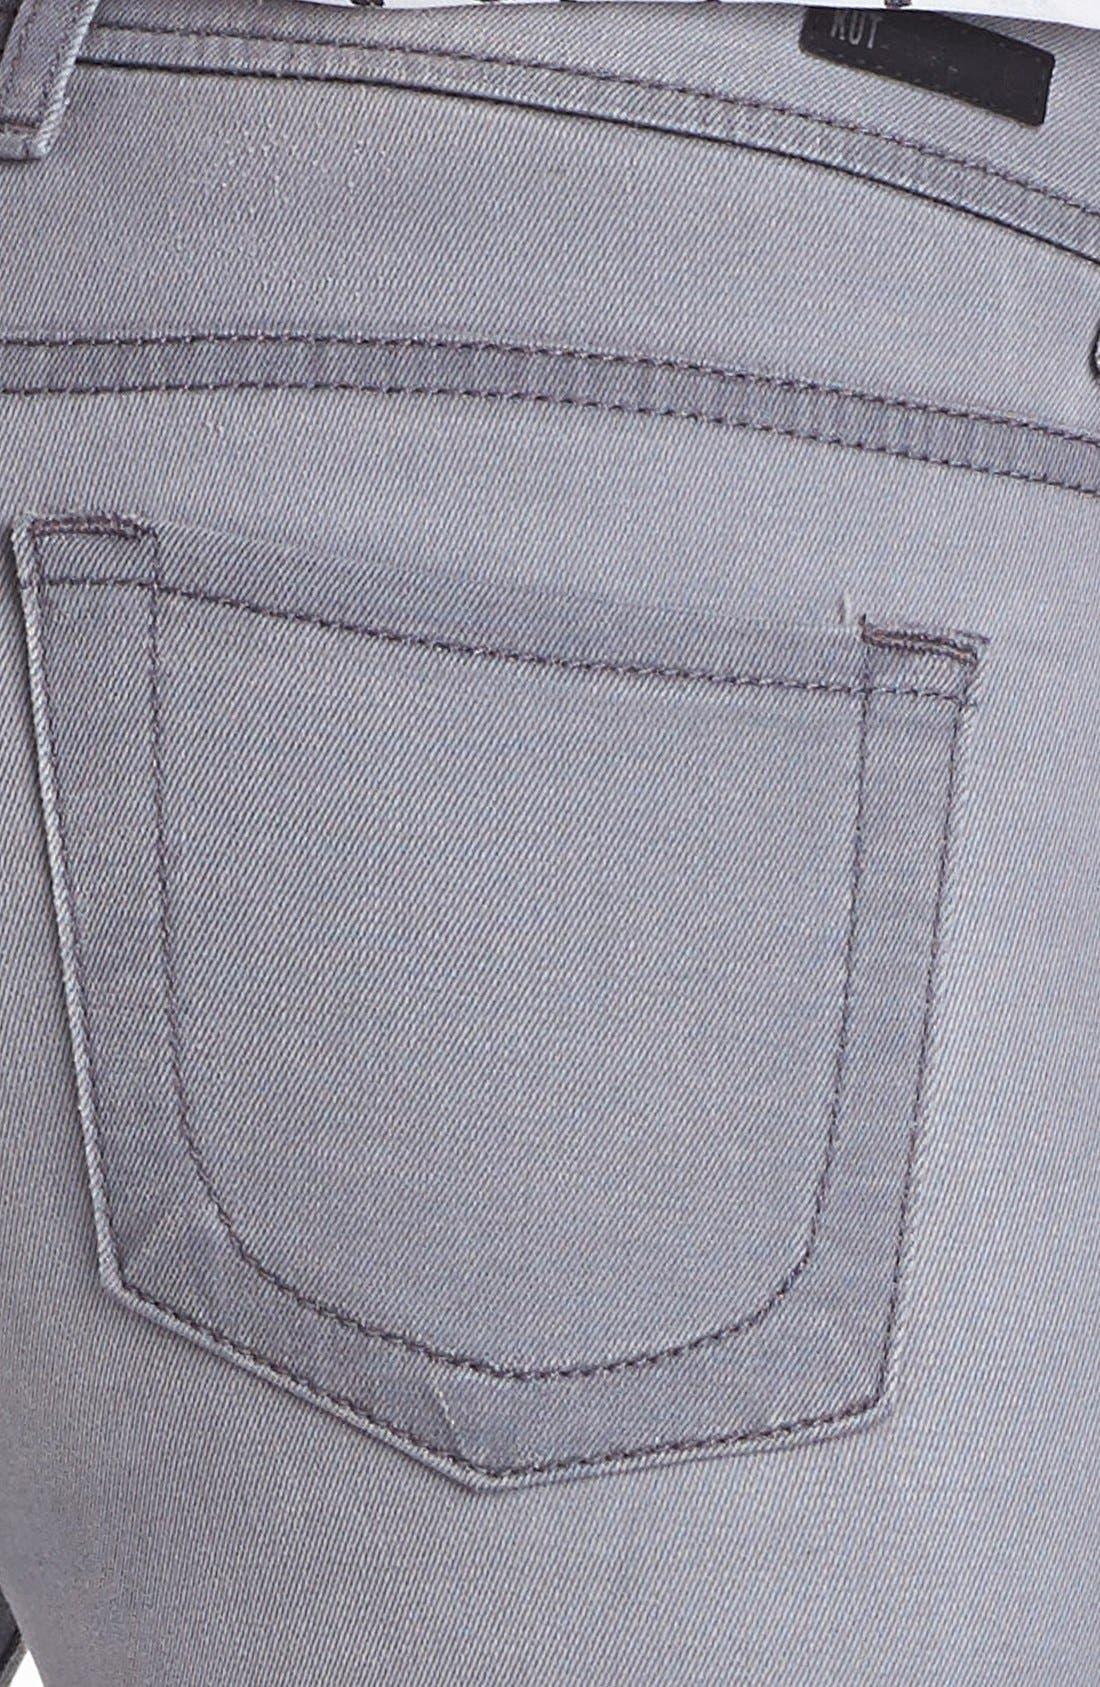 'Catherine' Slim Boyfriend Jeans,                             Alternate thumbnail 5, color,                             020